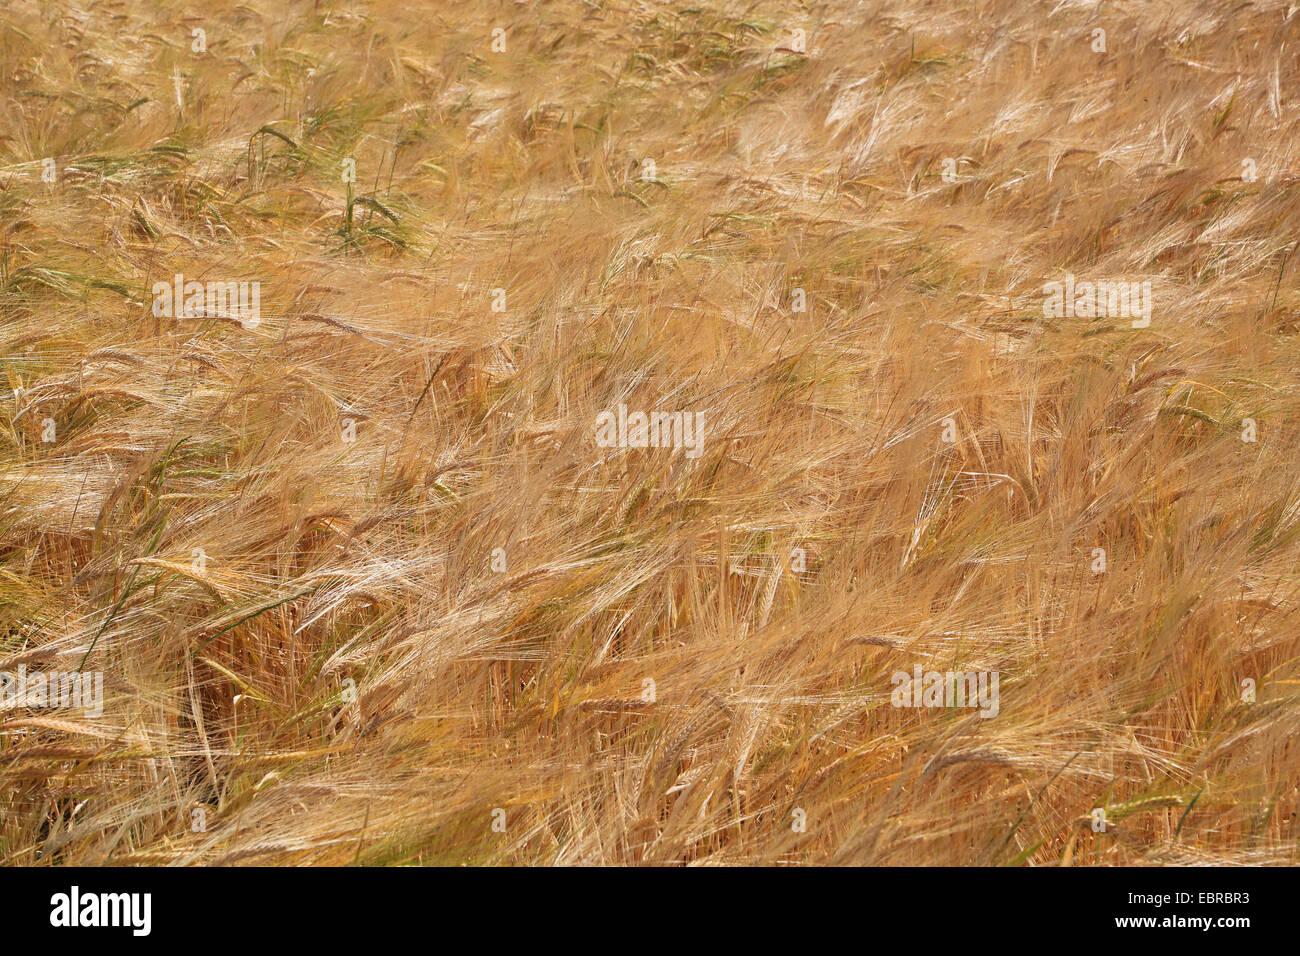 barley (Hordeum vulgare), mature barley field, Germany - Stock Image